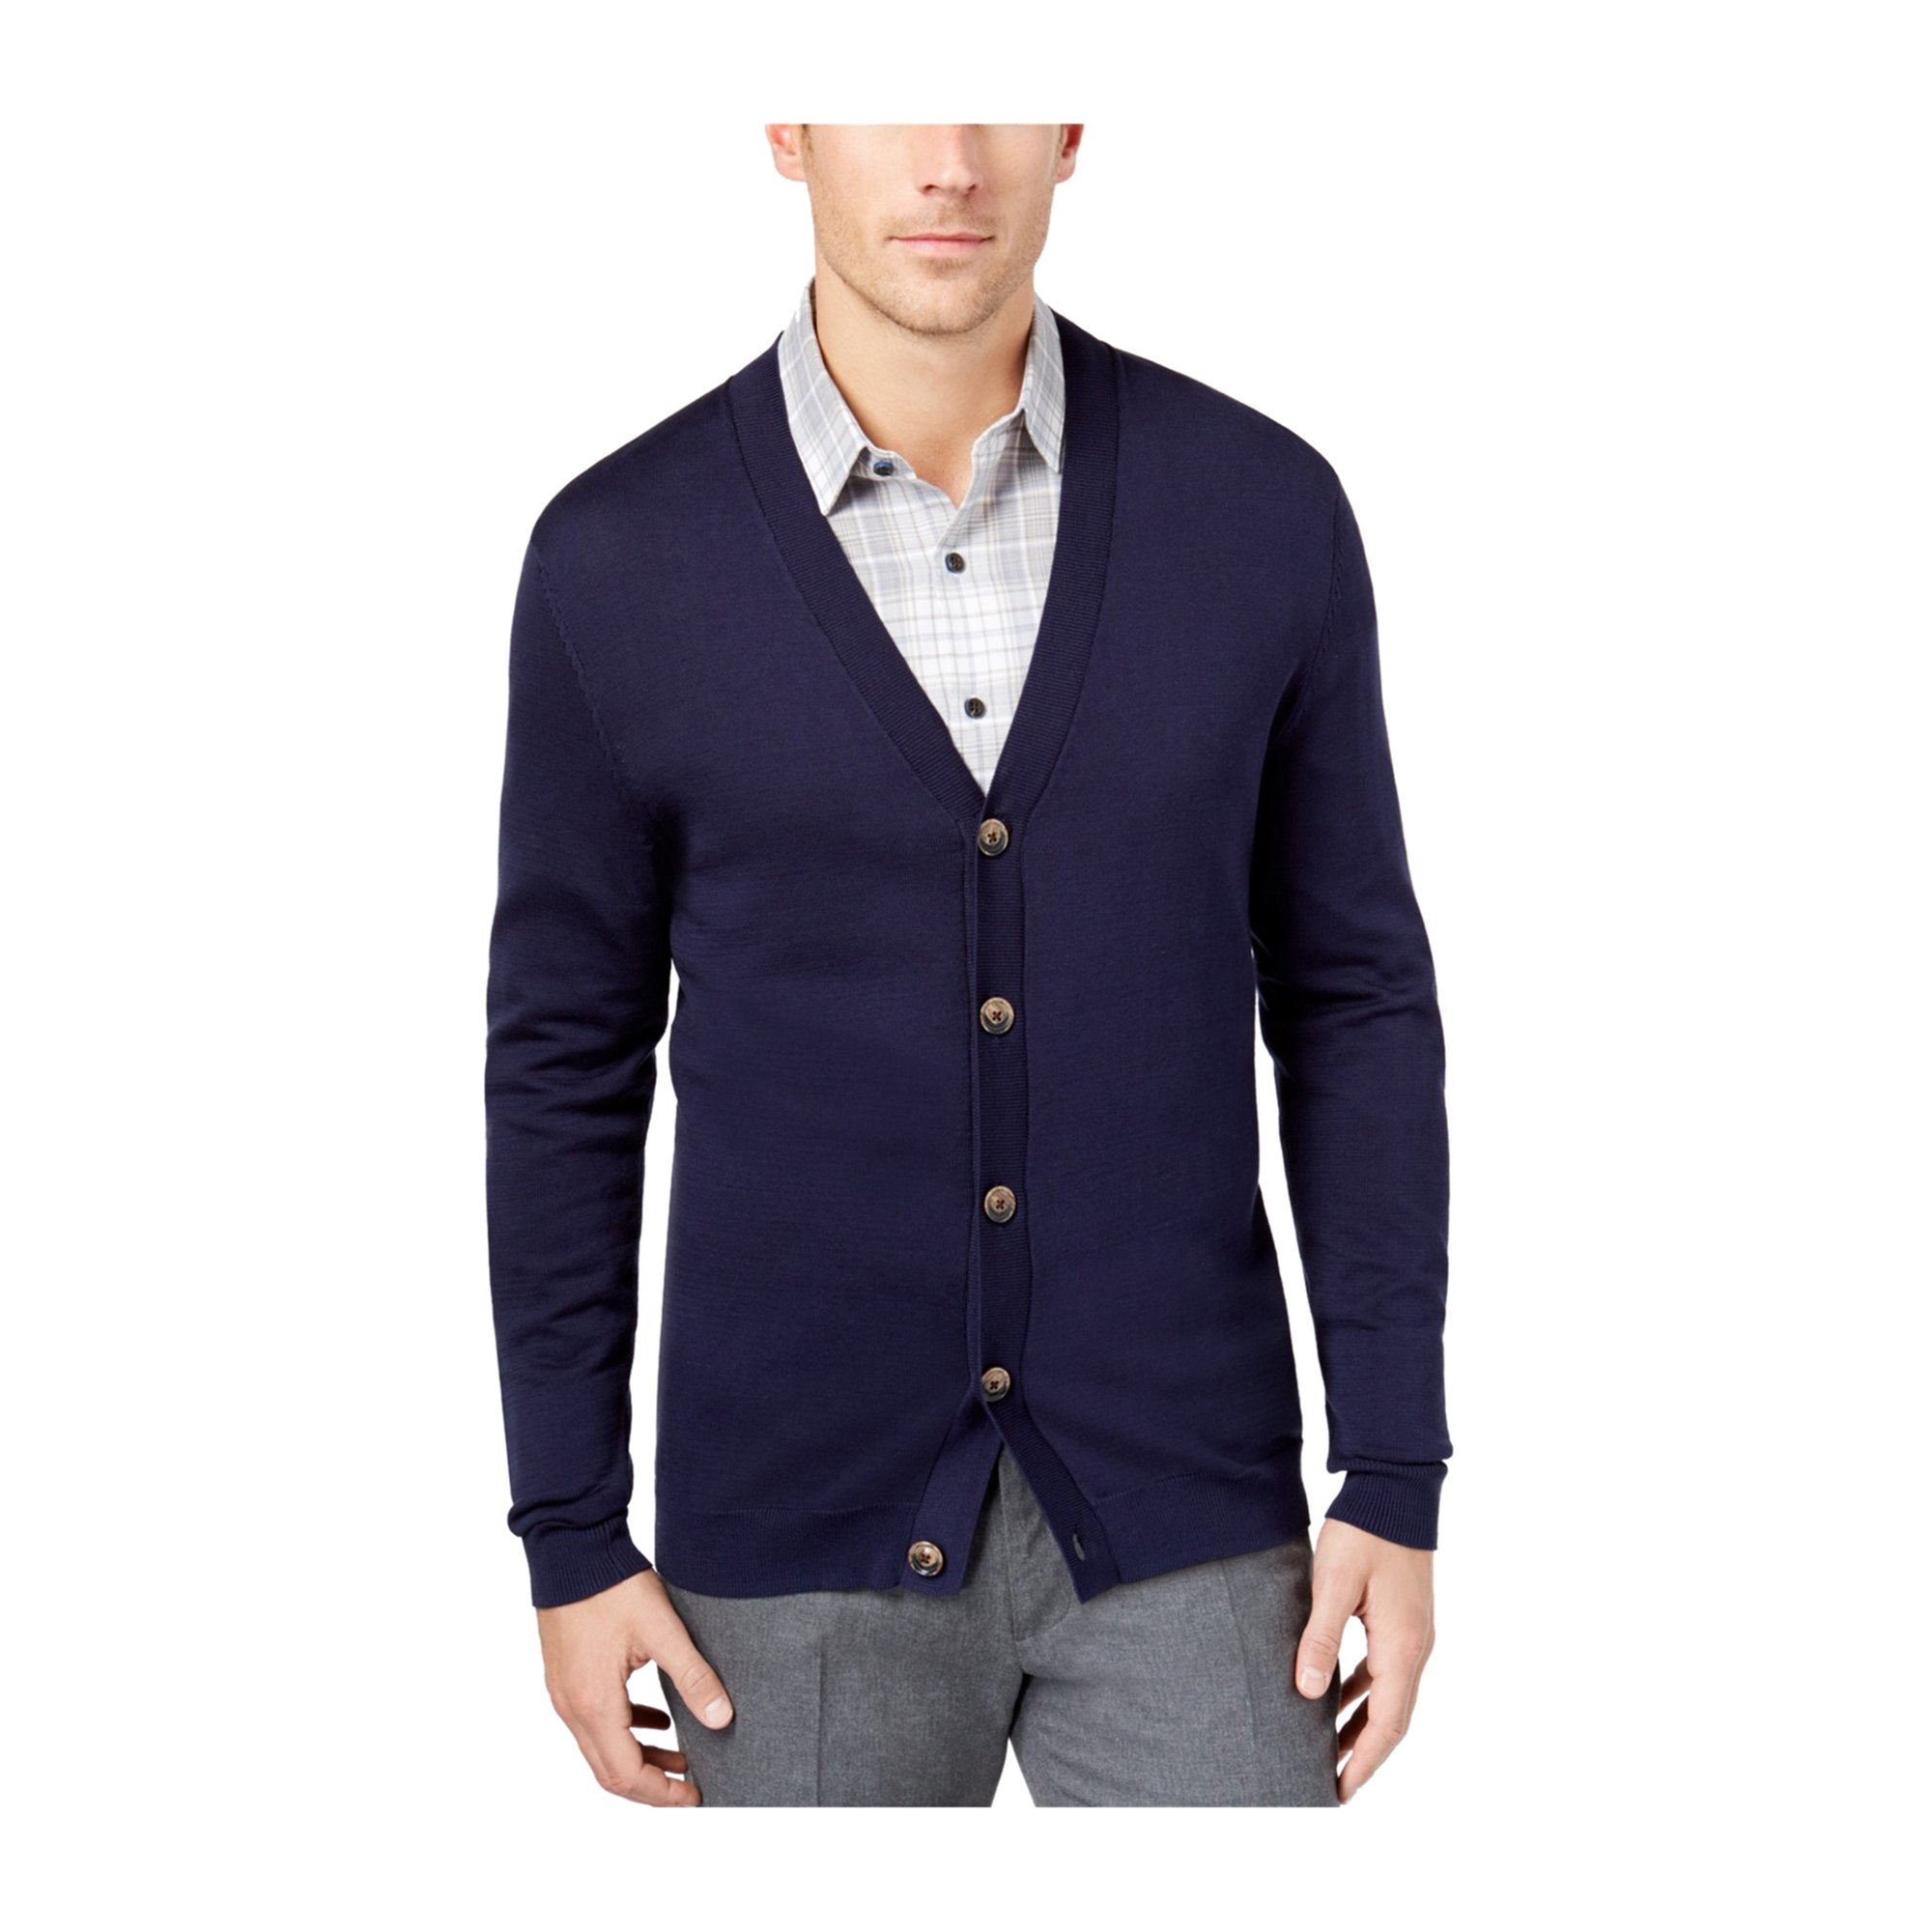 Tasso Elba Mens Supima Cotton Cardigan Sweater navyblue S